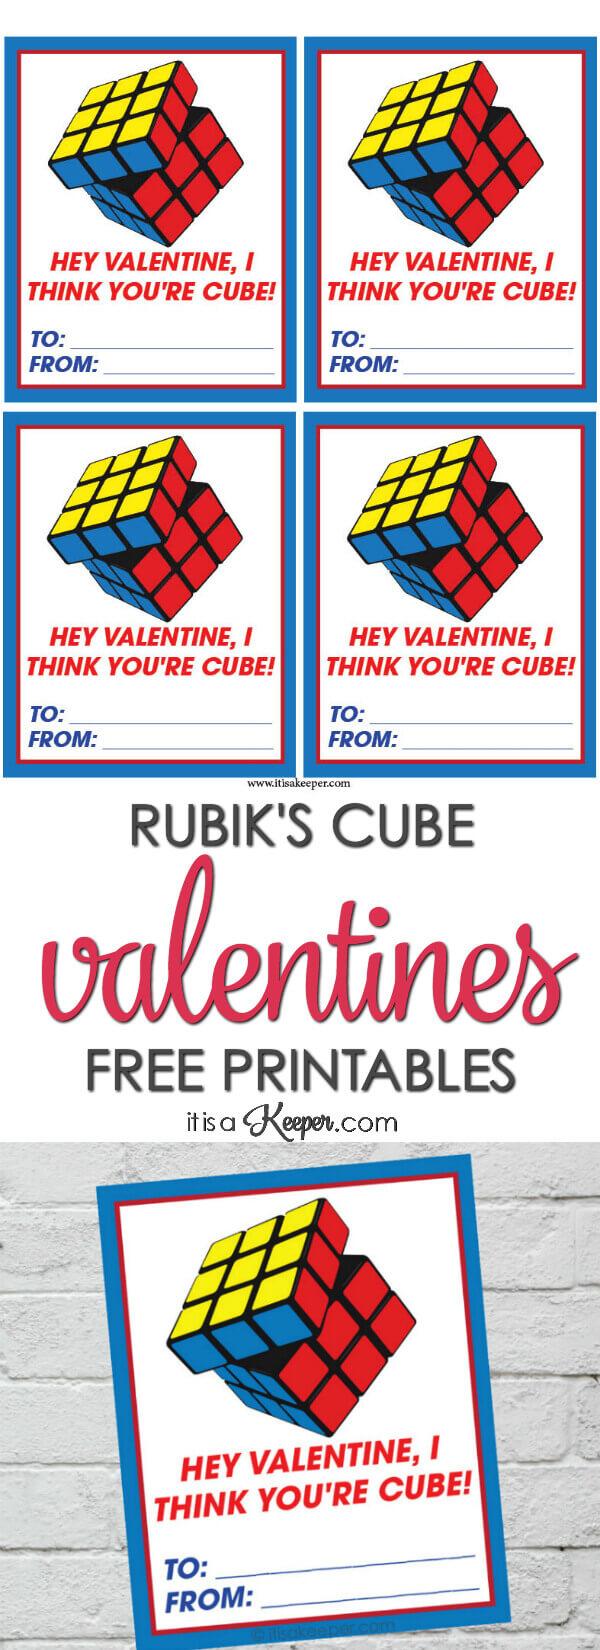 Rubiks Cube Valentine Printables - free printable Rubiks Cube themed Valentines for you to print and share